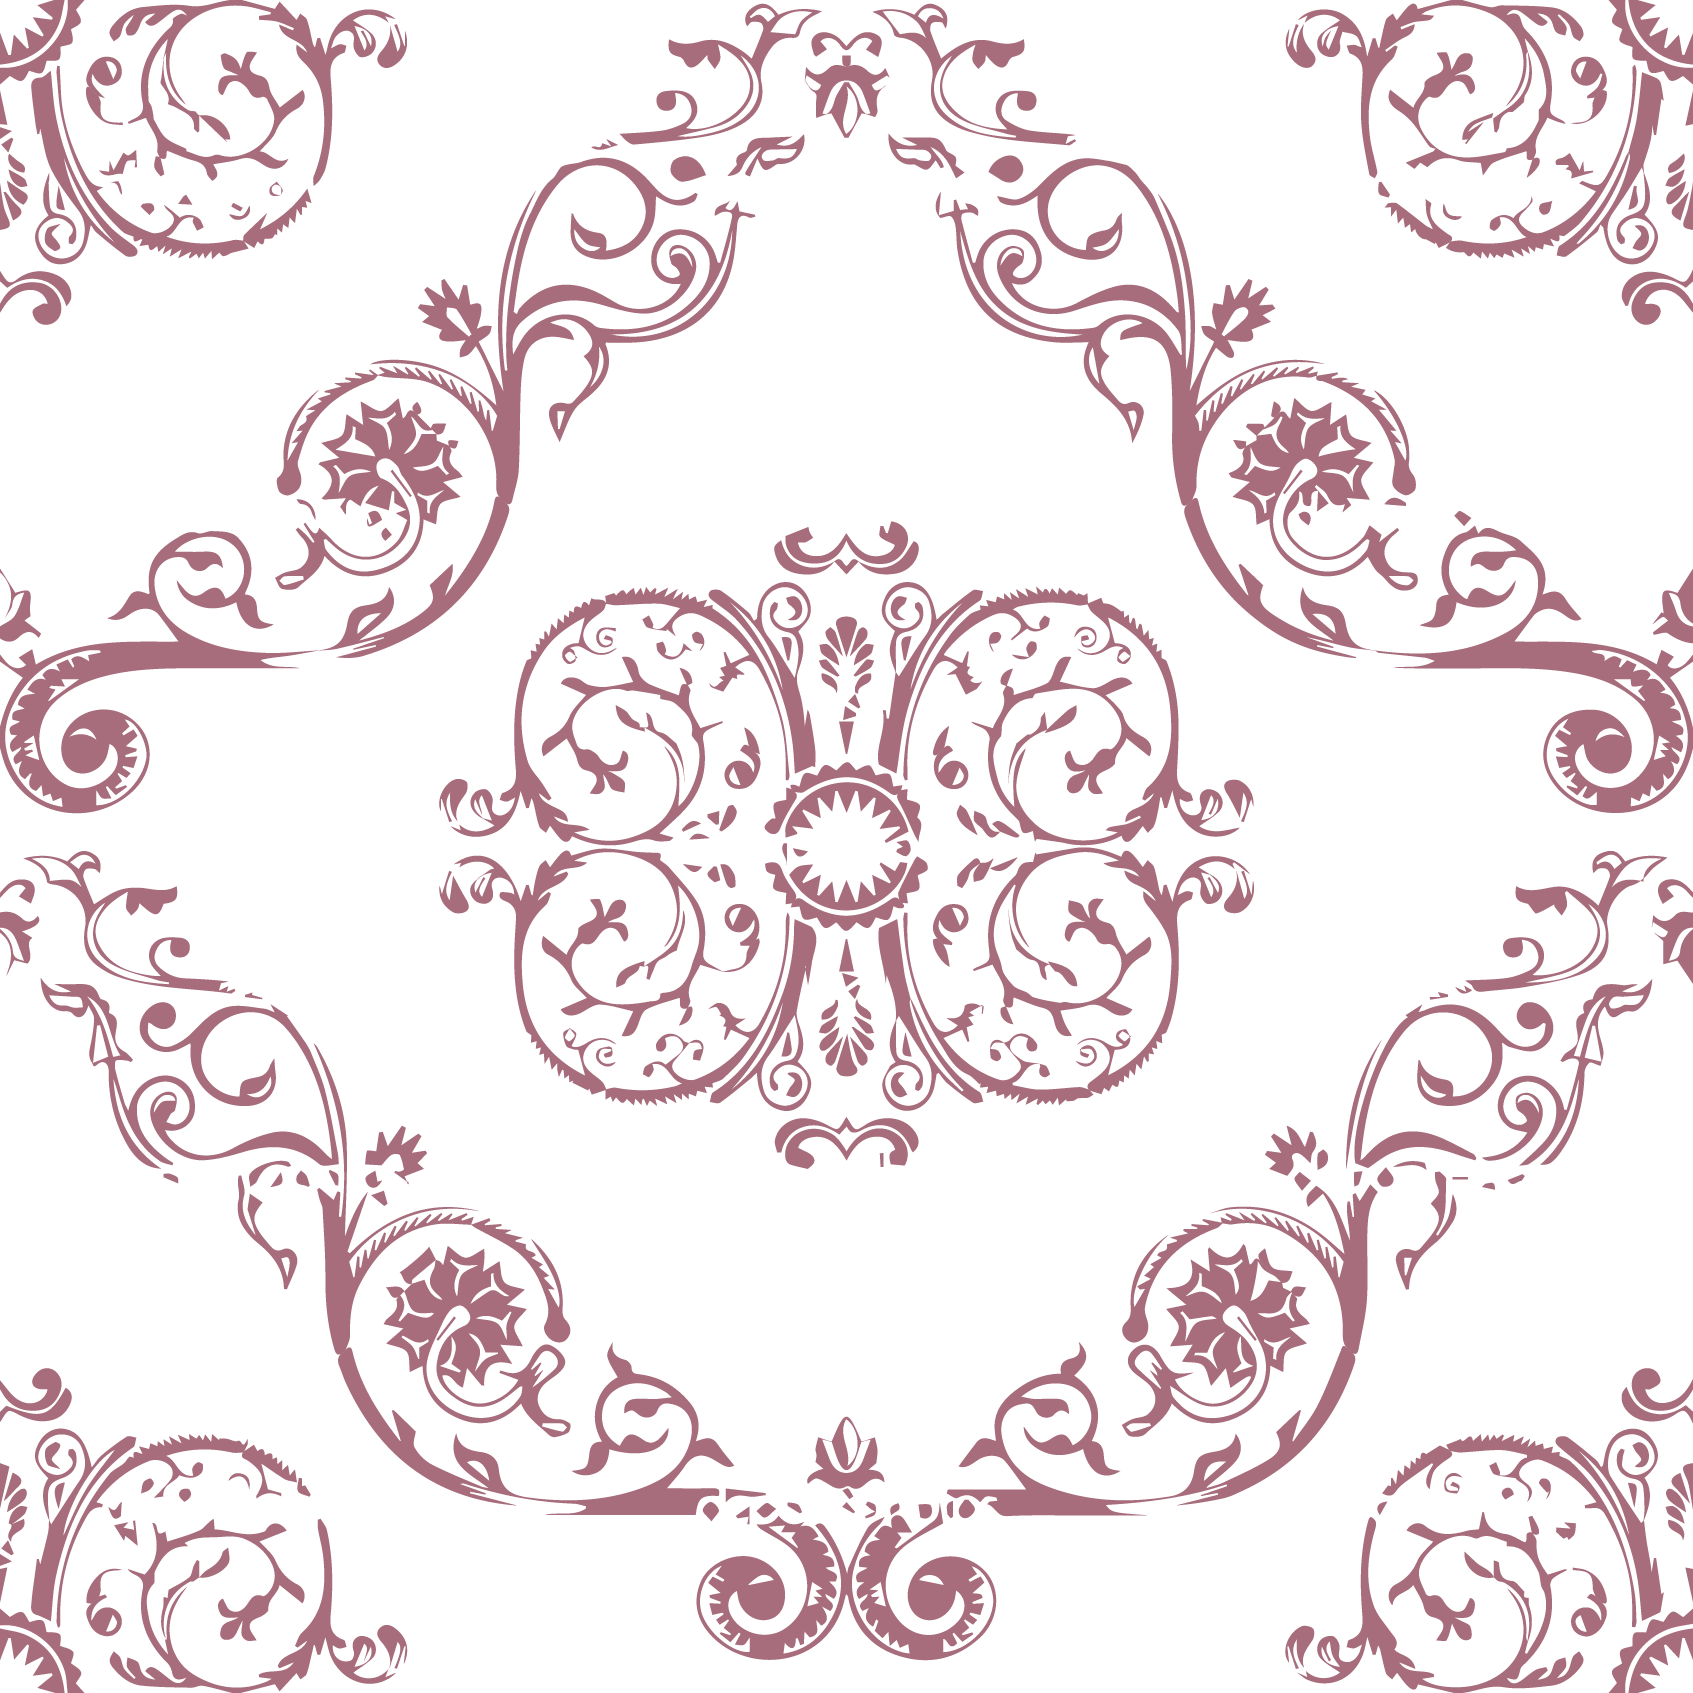 Depositphotos_5814734 Seamless Vintage Pattern Texture Wallpaper Background. Png